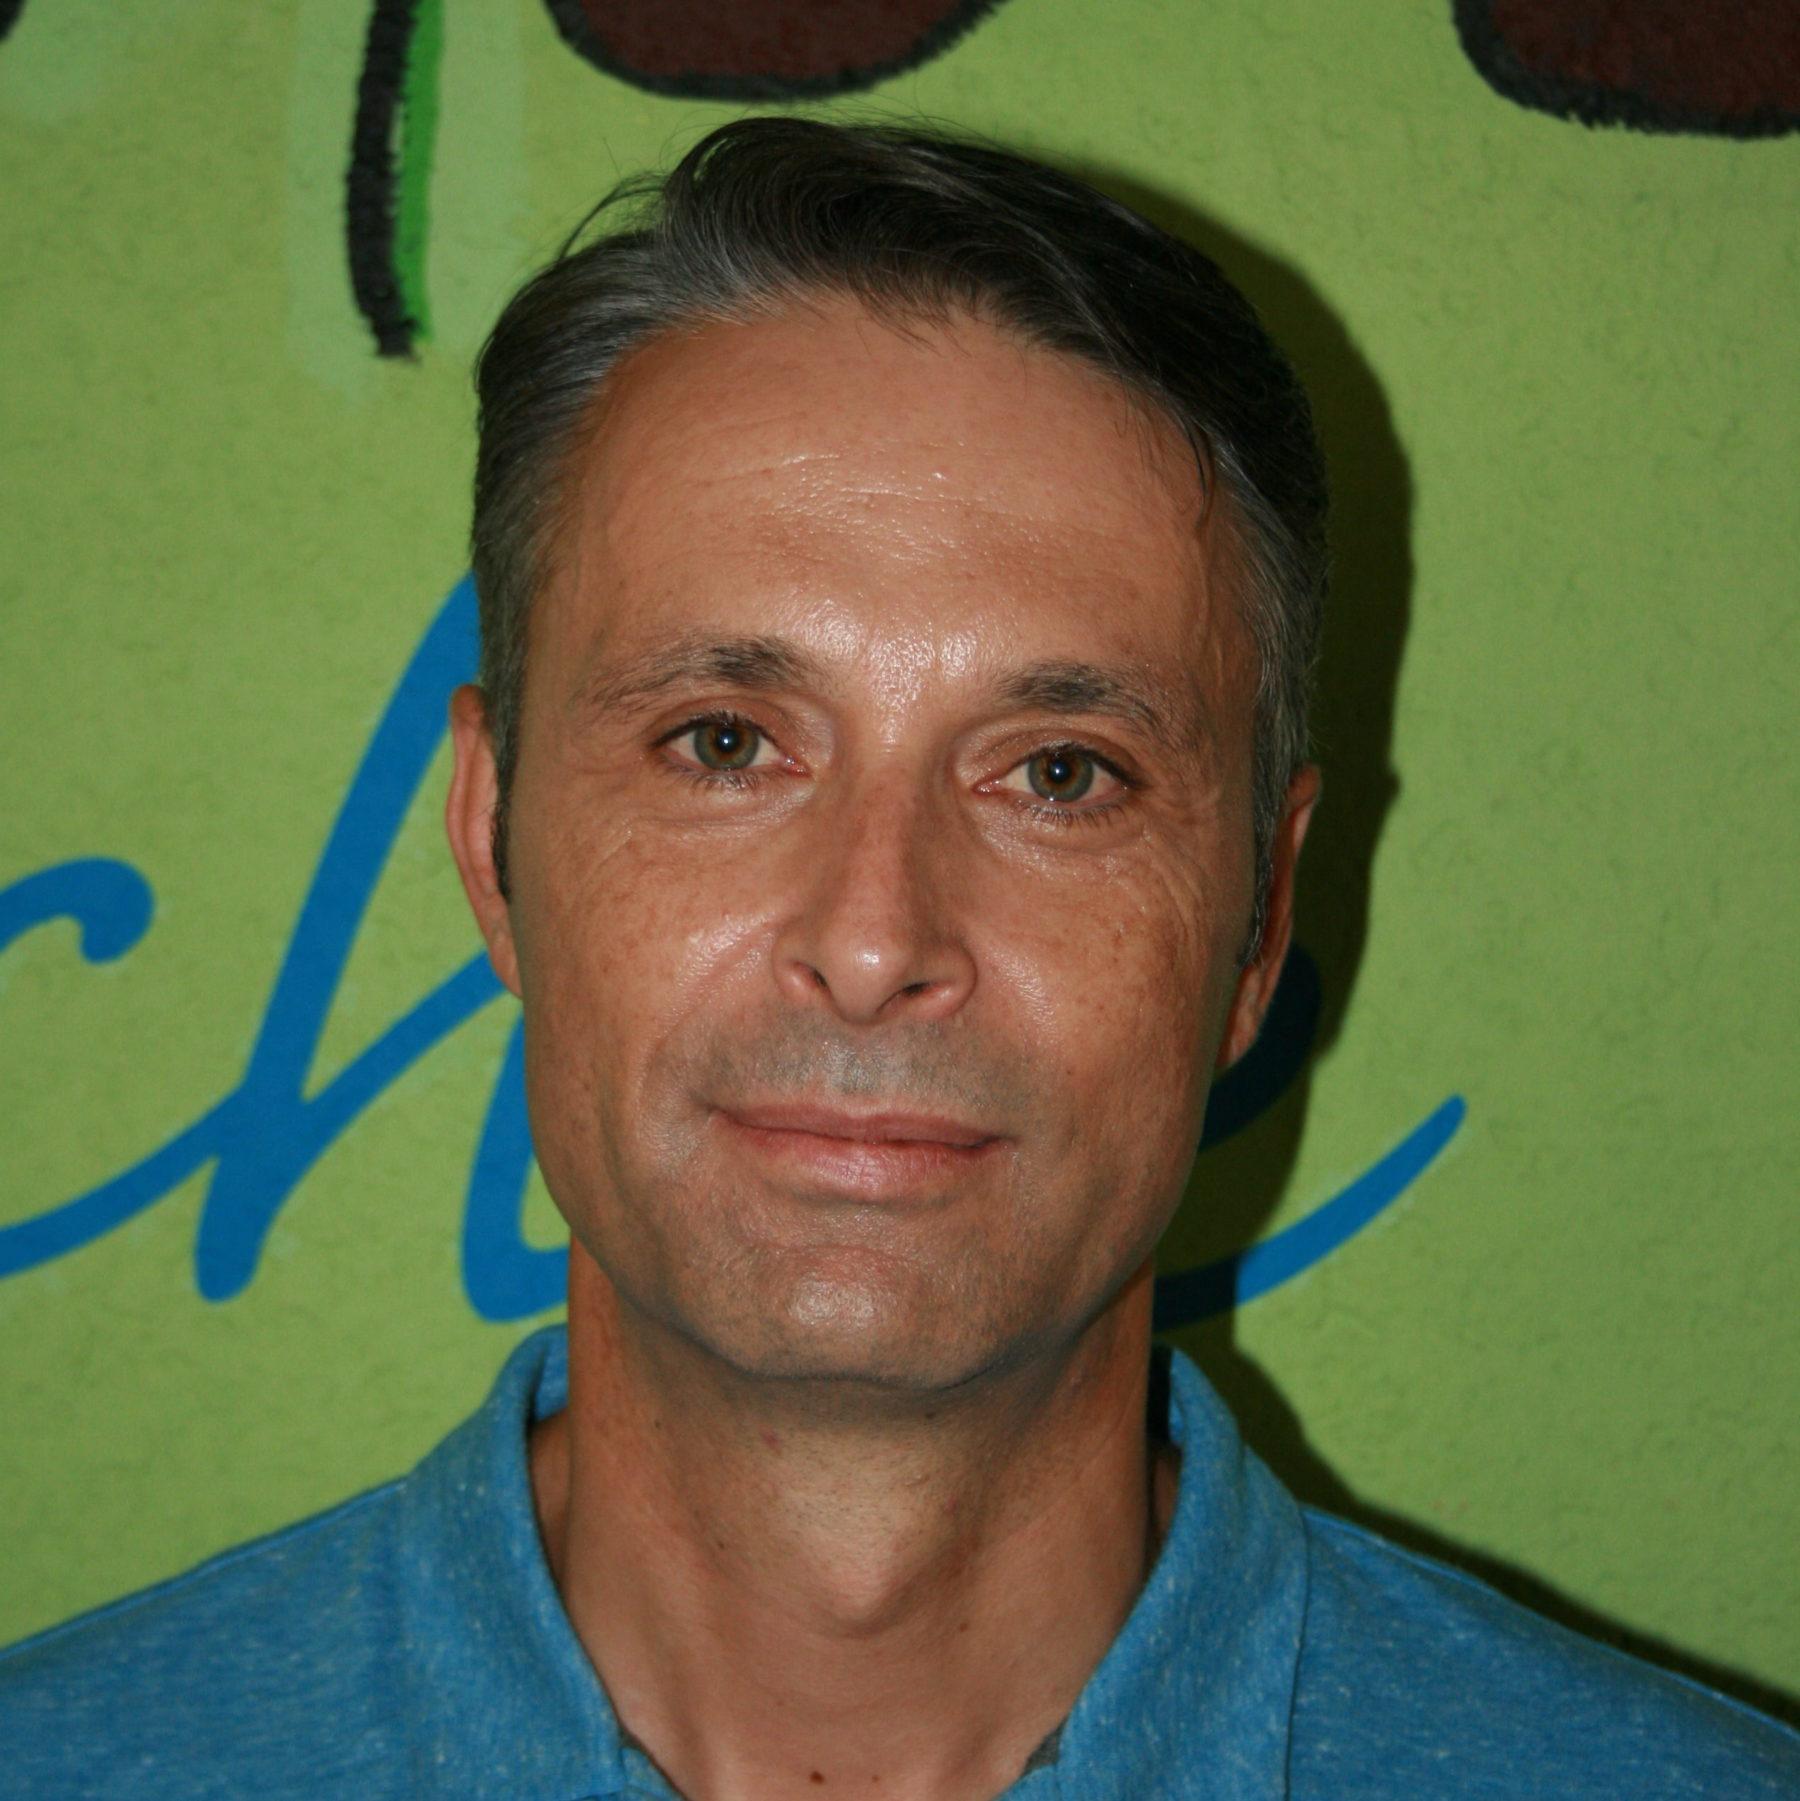 Giuliano Sabato